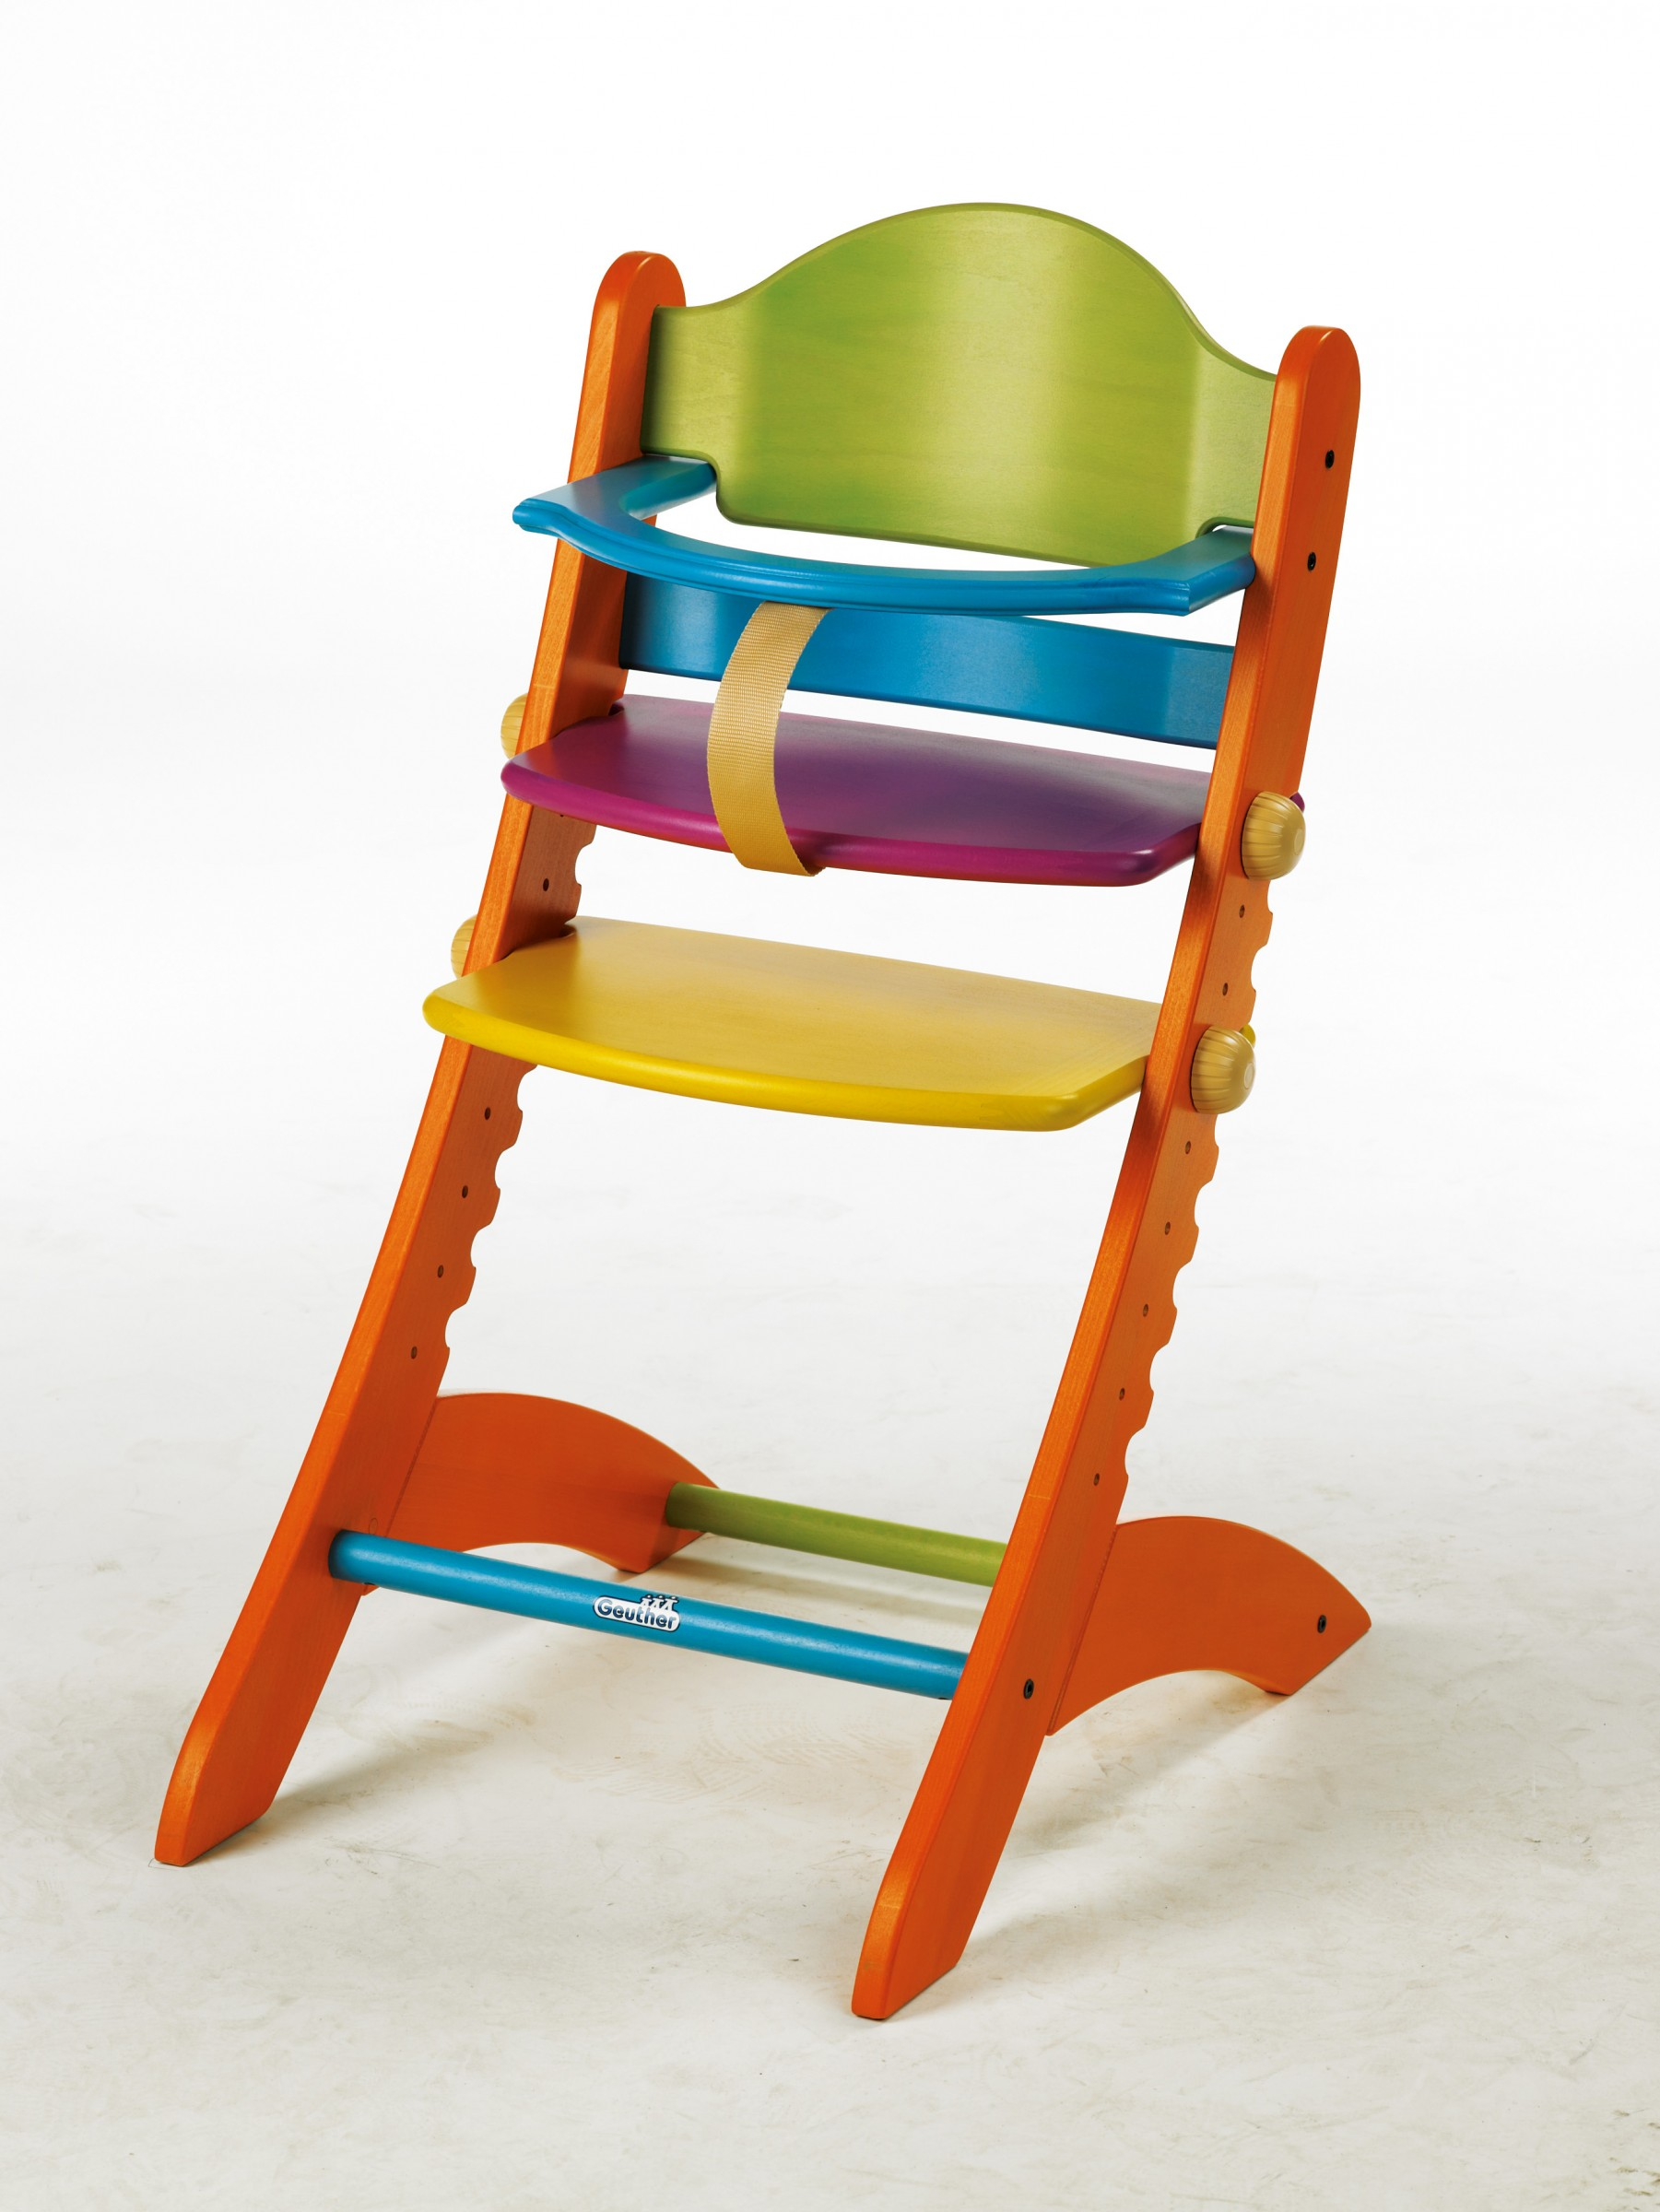 kinderhochstuhl holz top preise schnelle lieferung kinderhaus. Black Bedroom Furniture Sets. Home Design Ideas